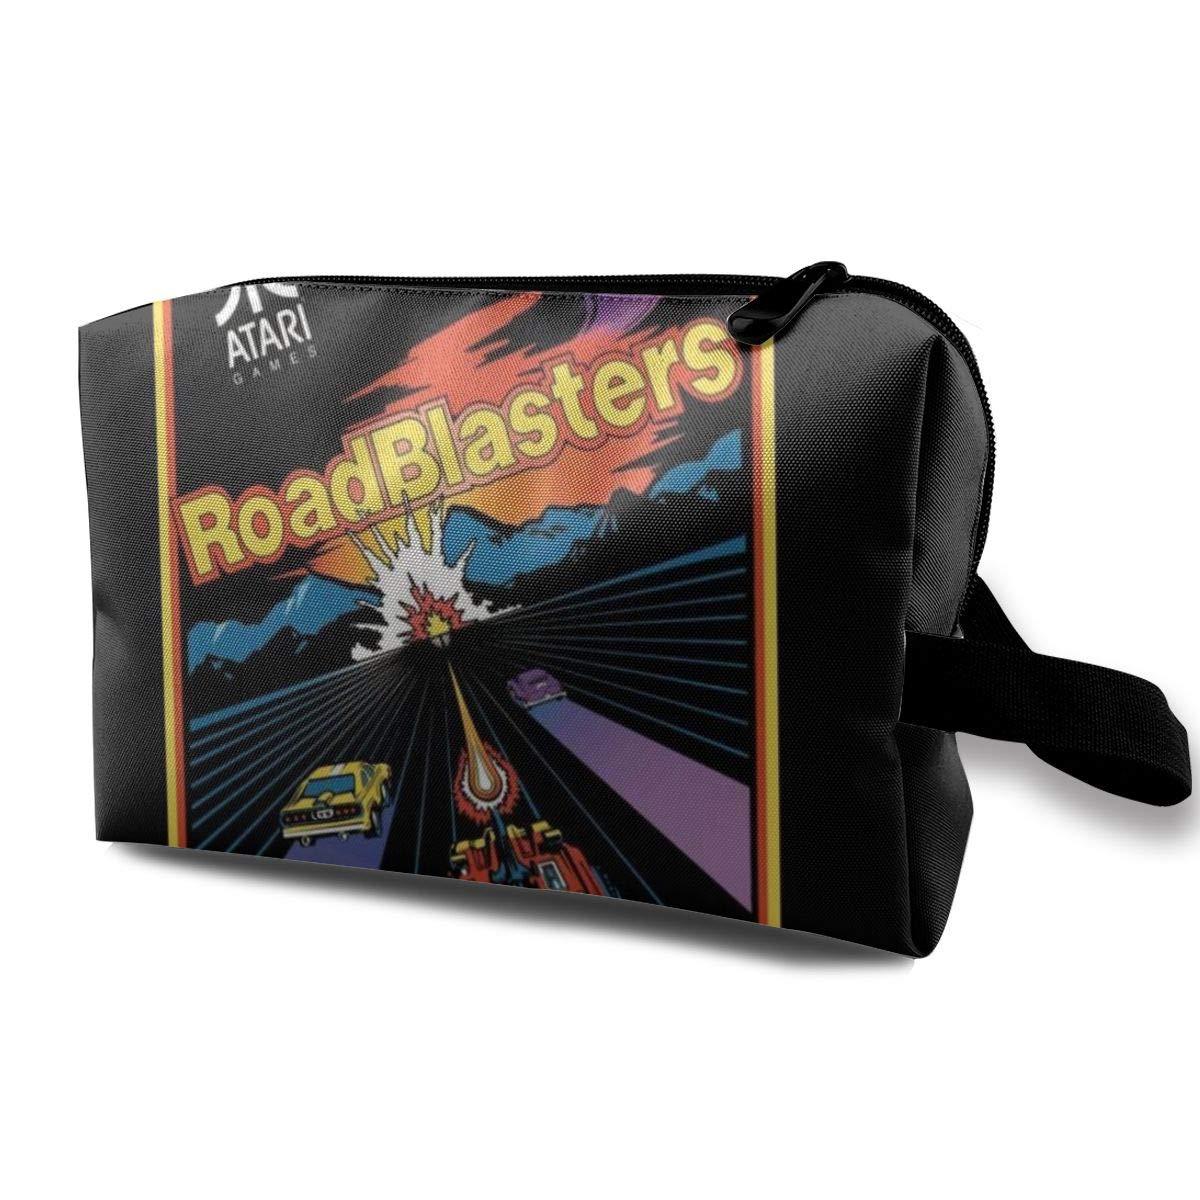 Makeup Bag Cosmetic Pouch RoadBlasters Cover Art Multi-Functional Bag Travel Kit Storage Bag